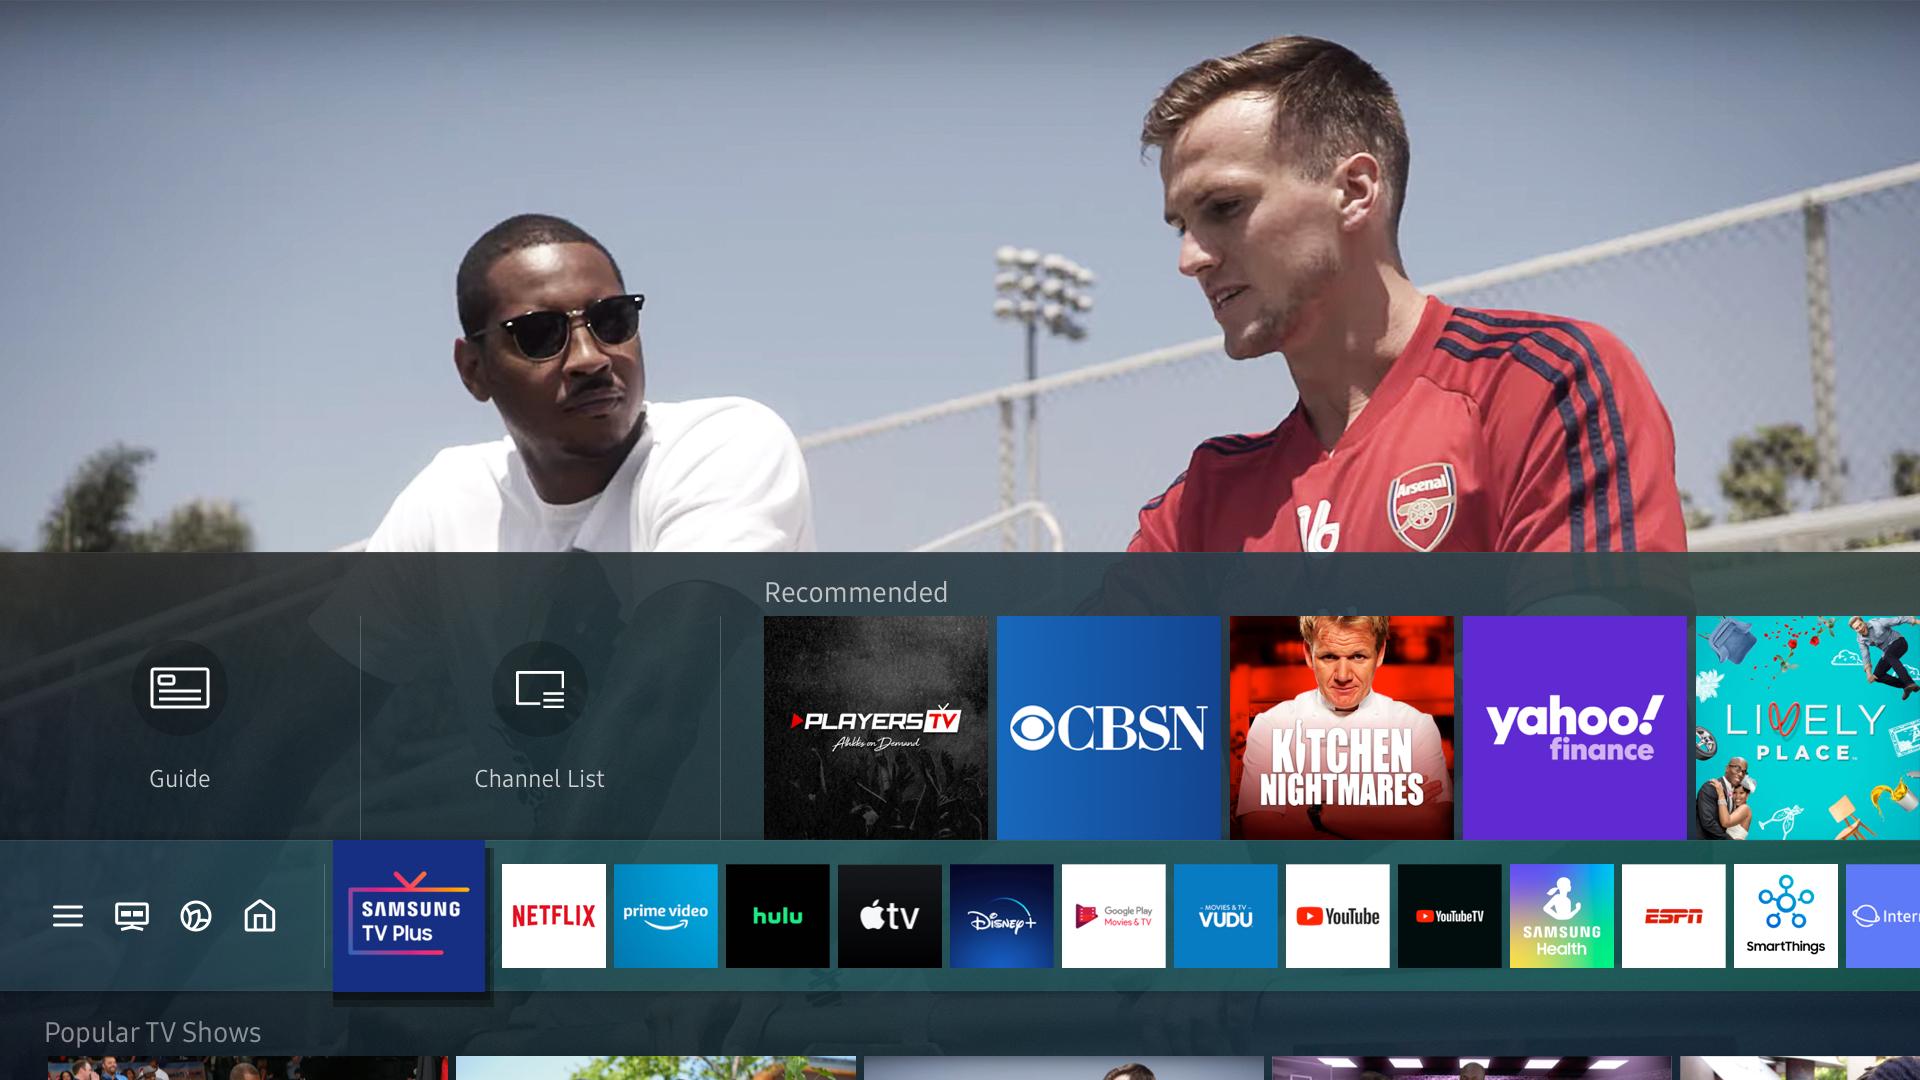 PlayersTV on Samsung TV Plus screenshot